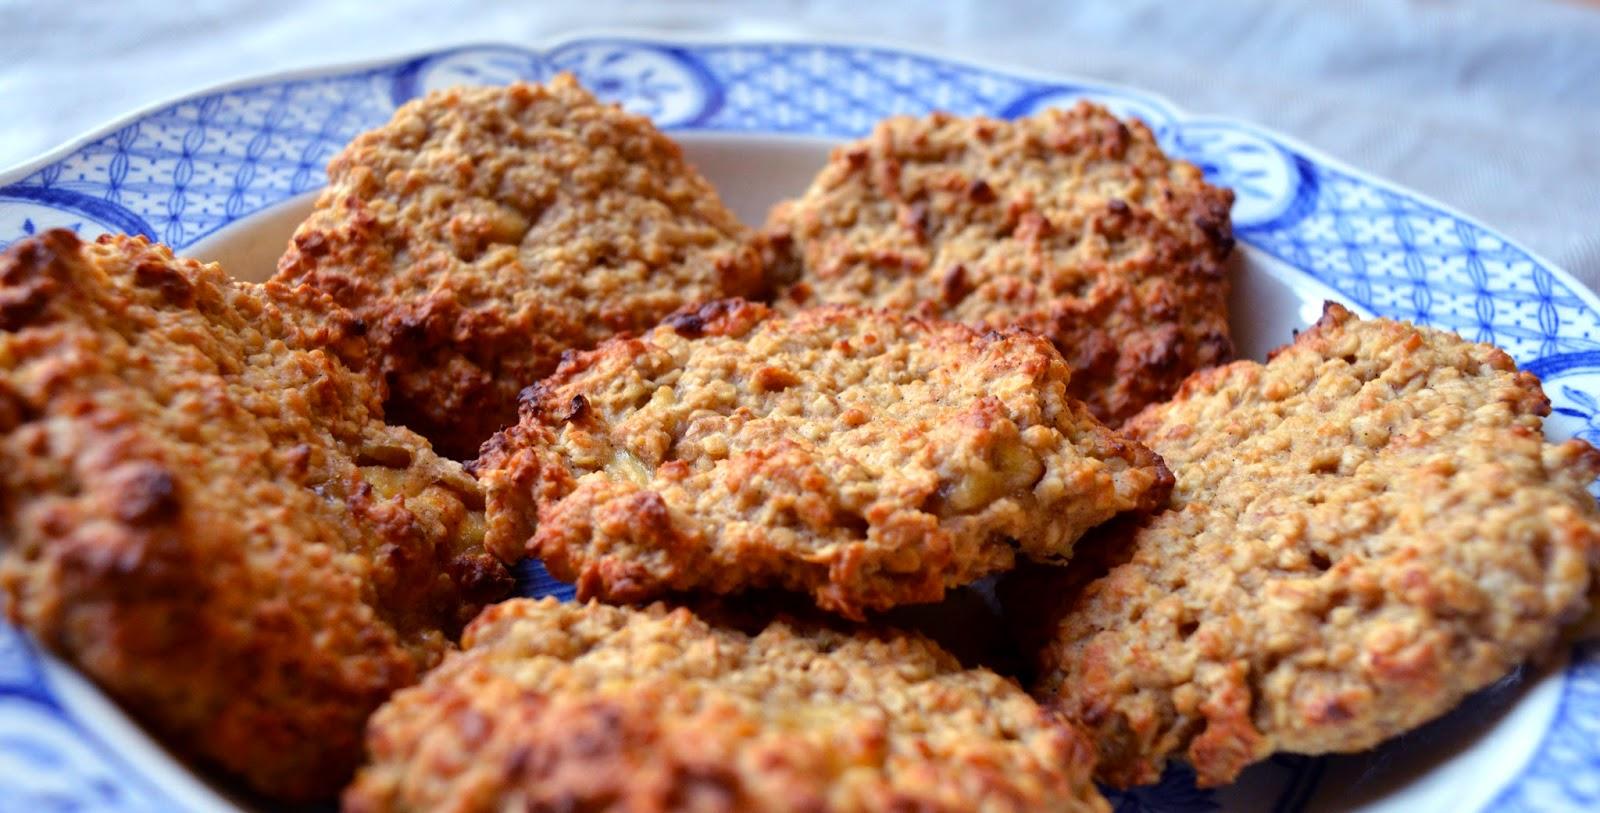 easy%2Bbanana%2Boatmeal%2Bcookies%2B2.jpg